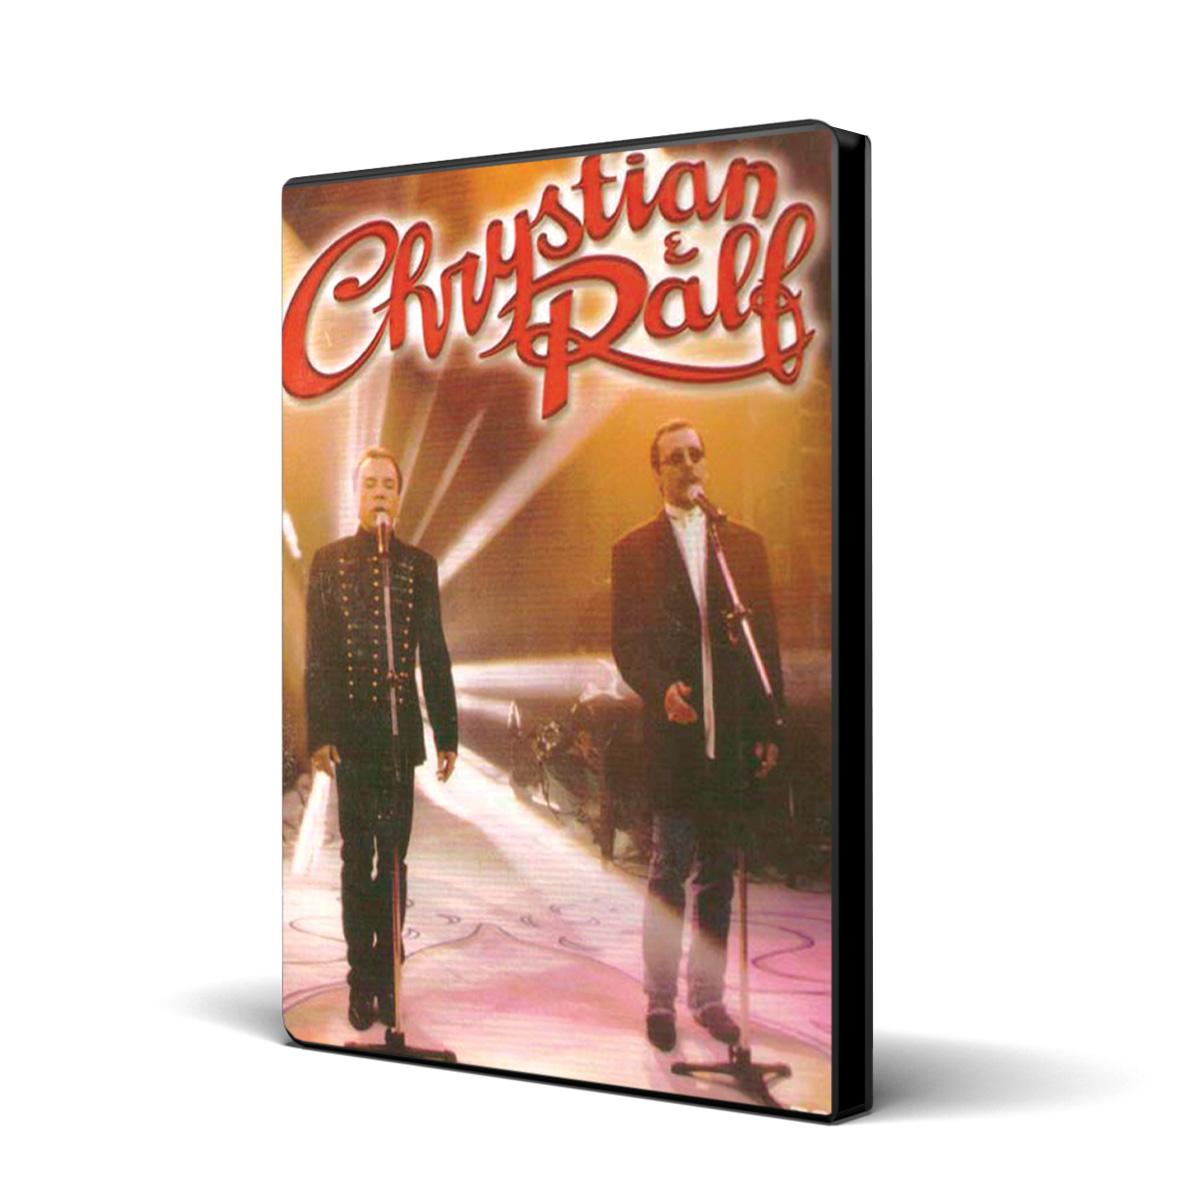 DVD Chrystian & Ralf